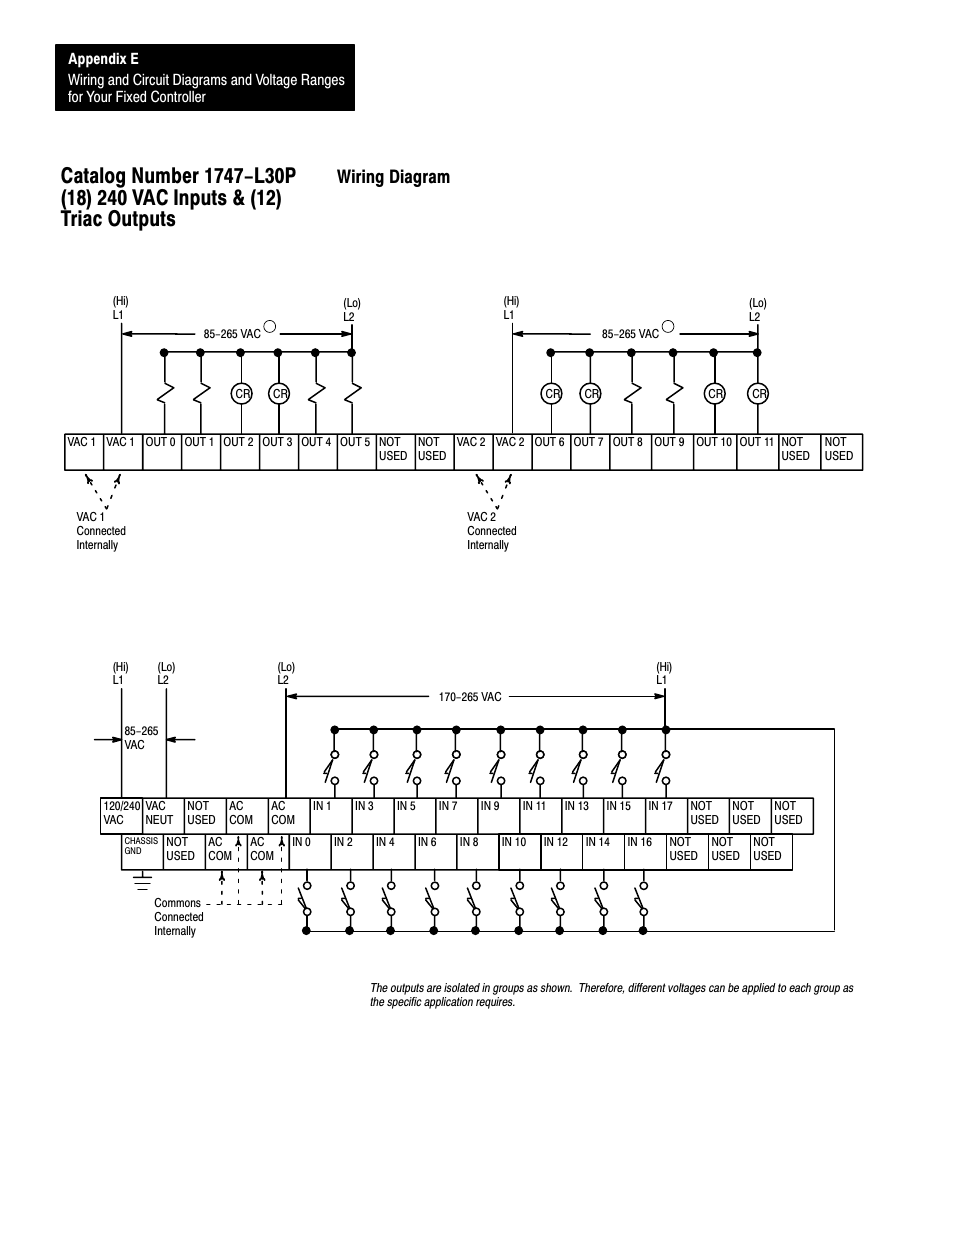 medium resolution of slc 500 wiring diagram simple wiring diagram supermax wiring diagram rockwell automation wiring diagram